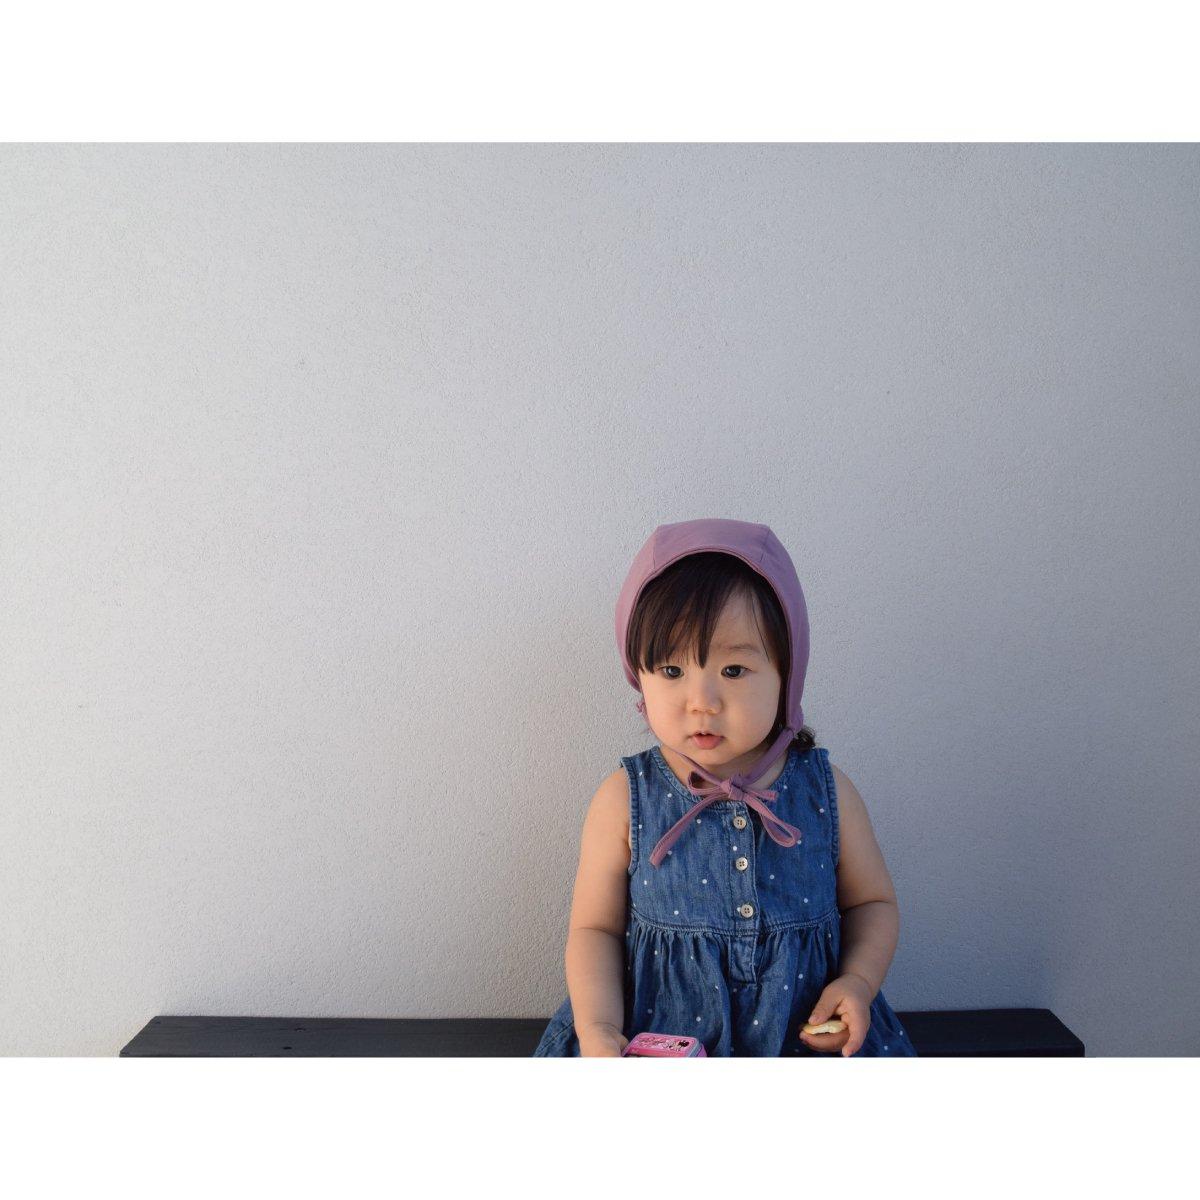 【BABY】Candy Bonnet 詳細画像16